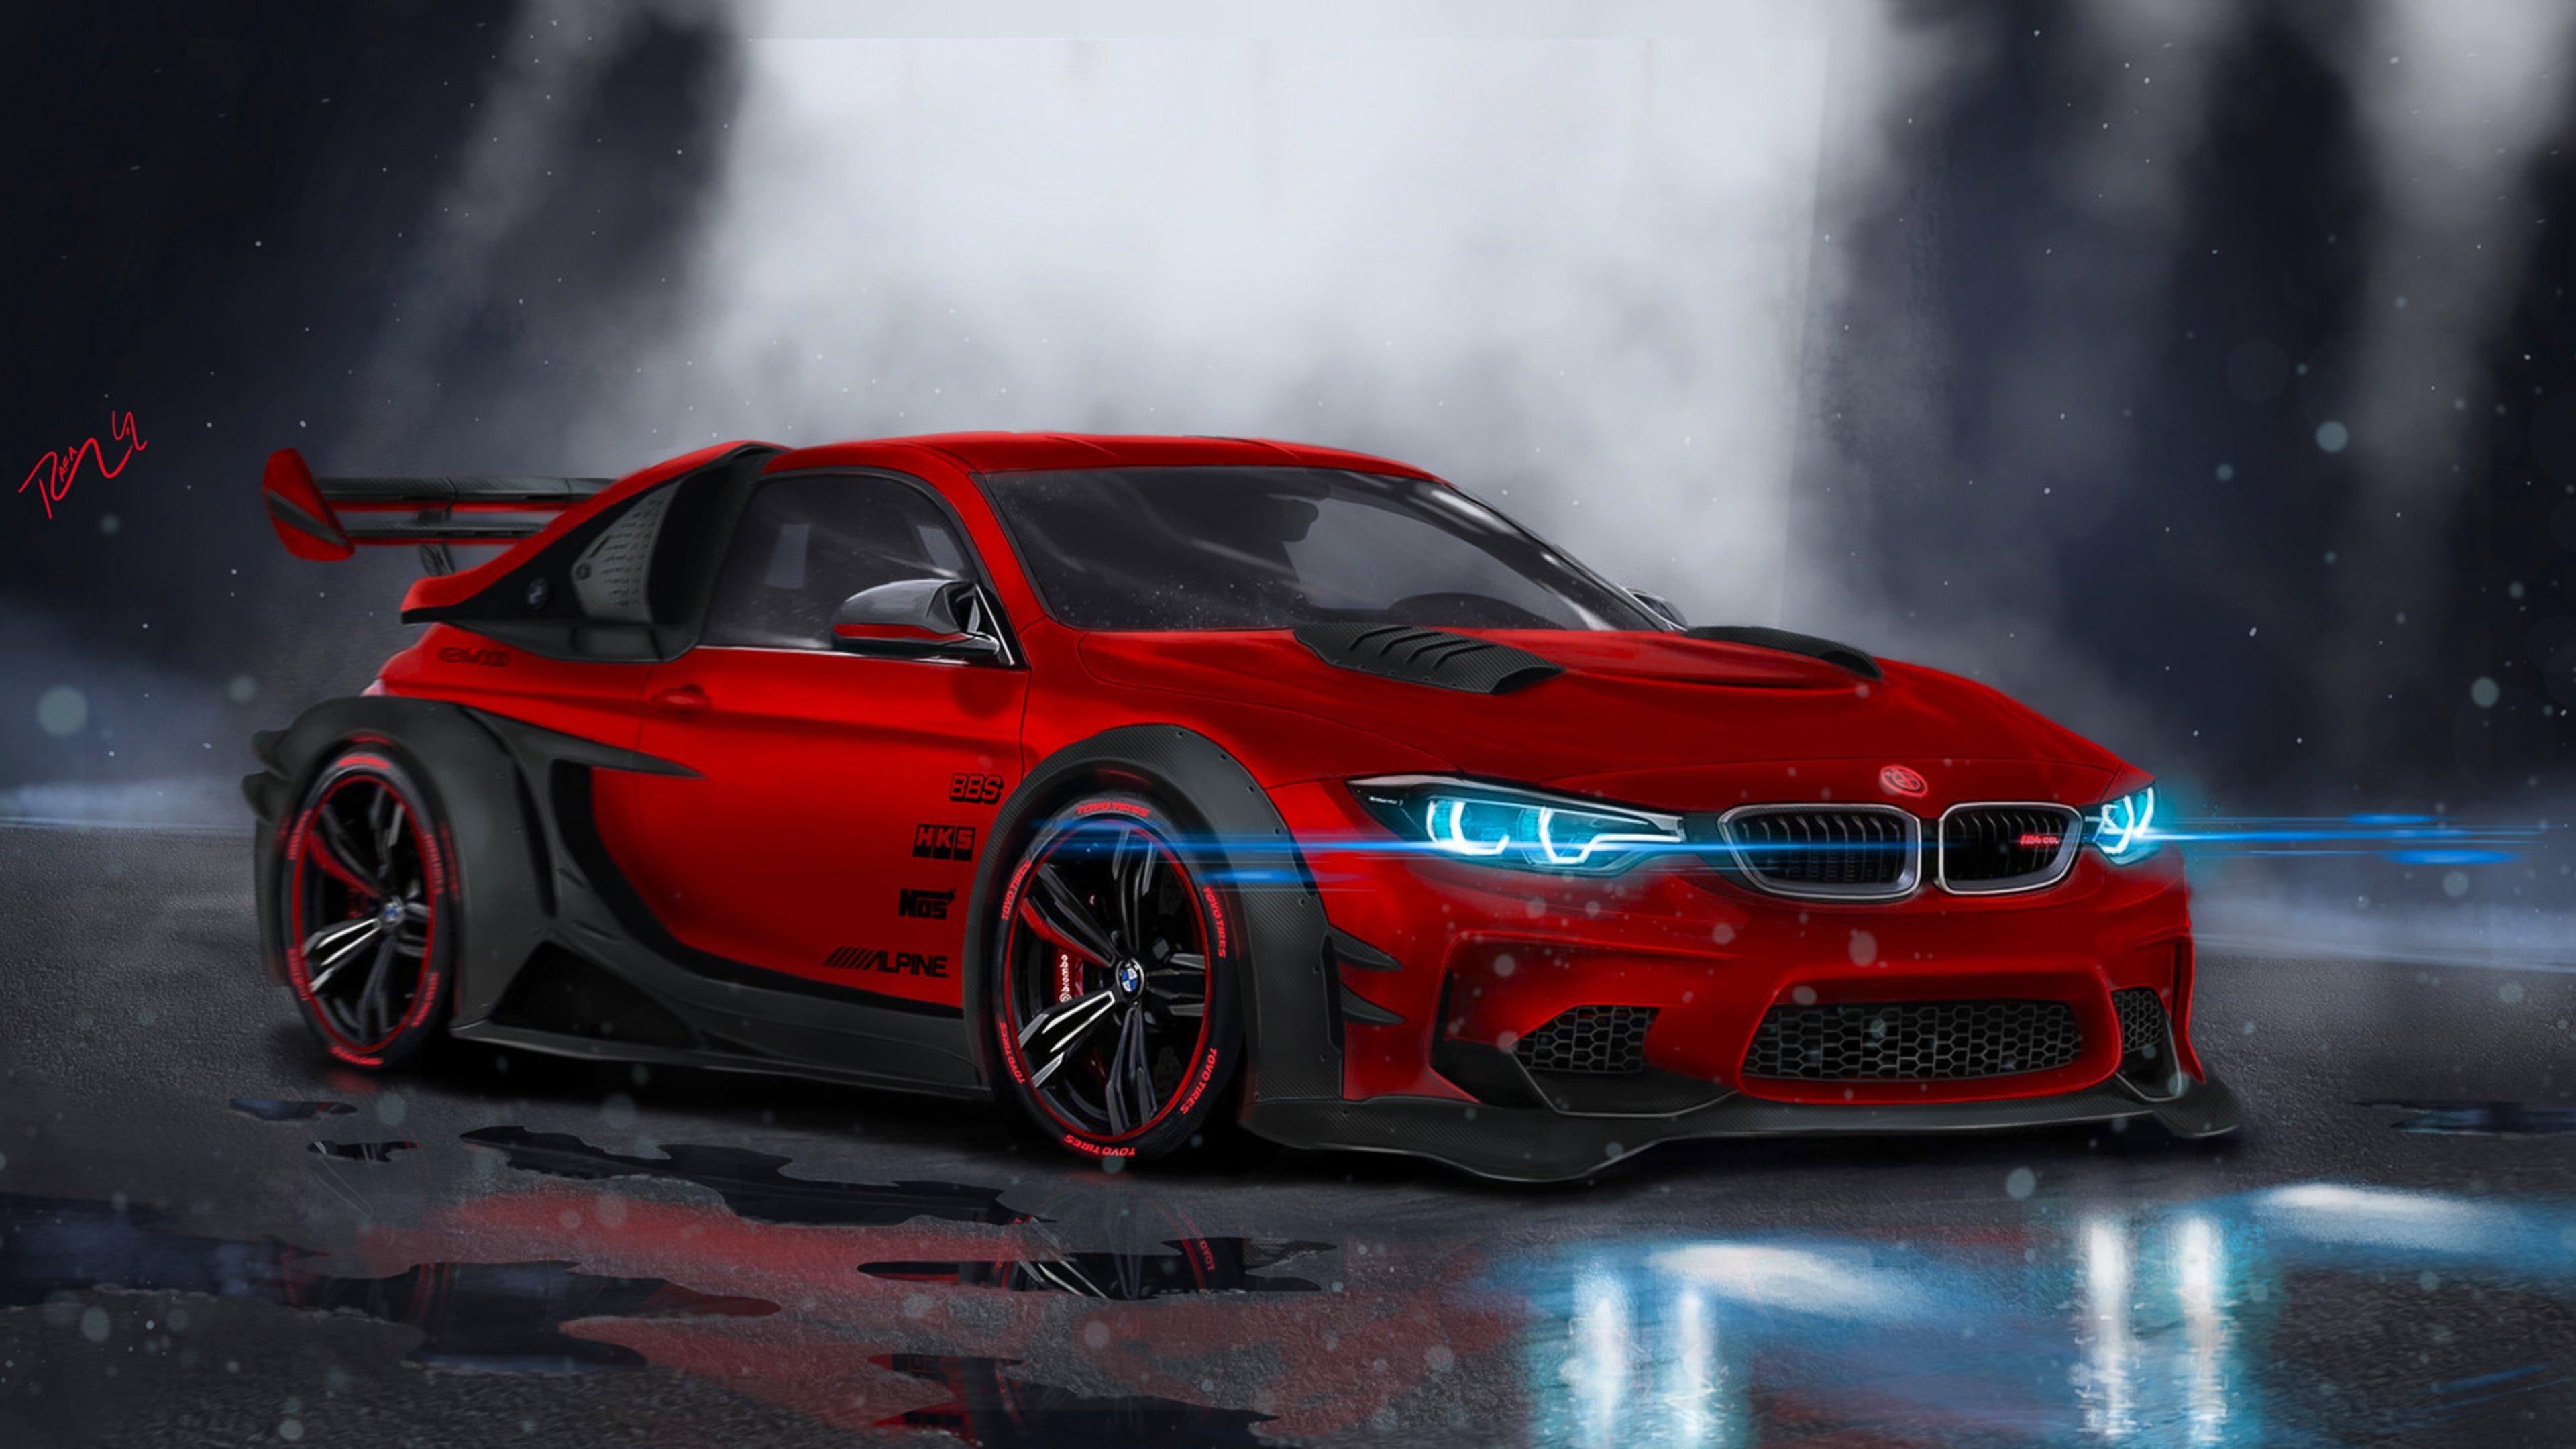 BMW Modified Car Wallpapers #14268 - Download Page - Kokoangel.com